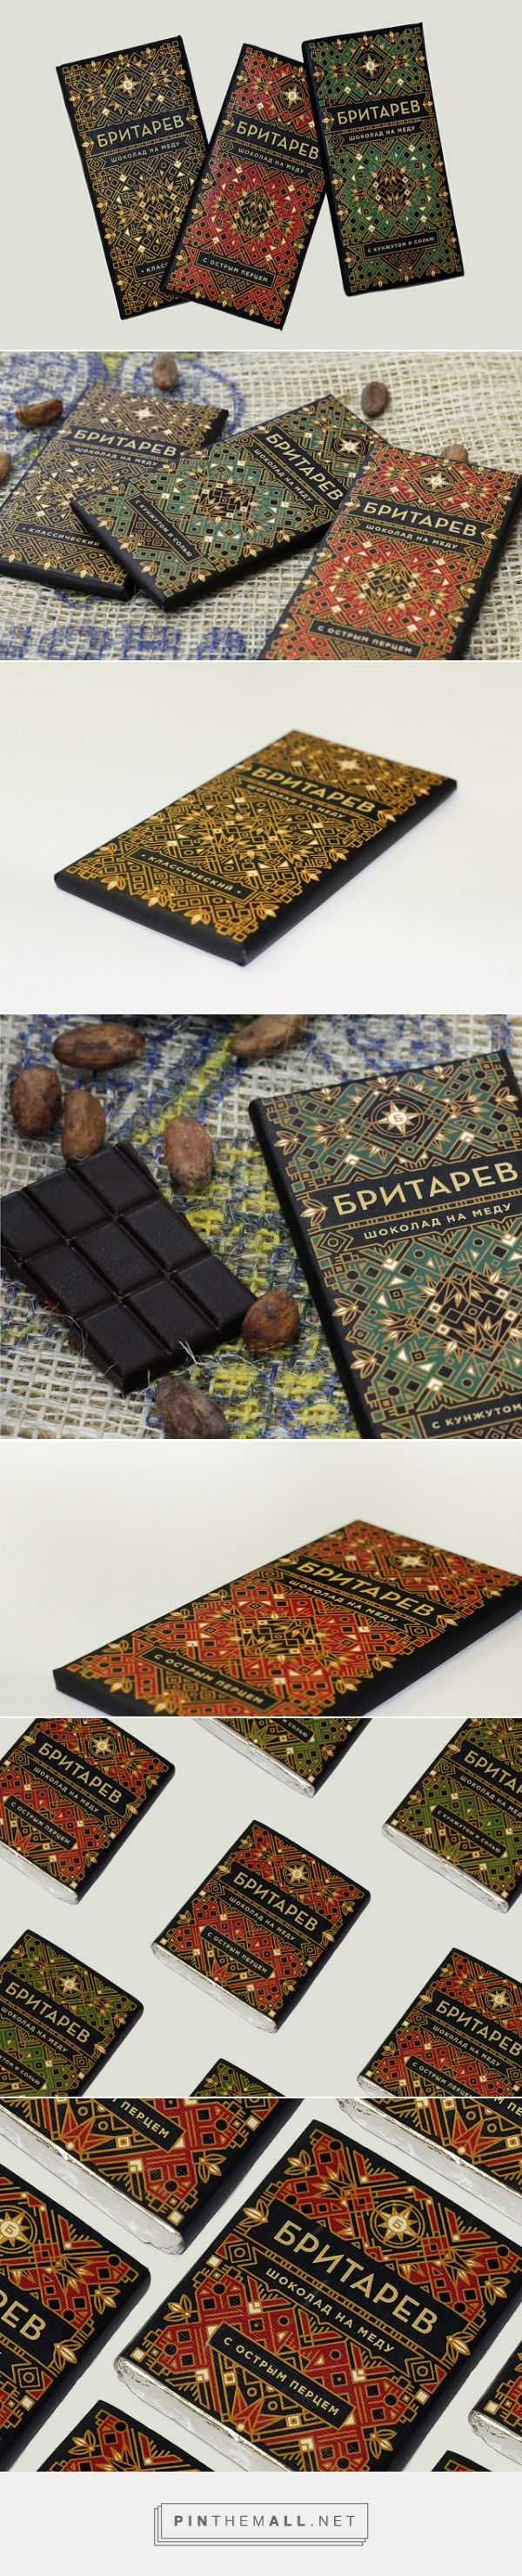 Britarev #Chocolate #packaging designed by Anna Ropalo - http://www.packagingoftheworld.com/2015/05/britarev-chocolate.html